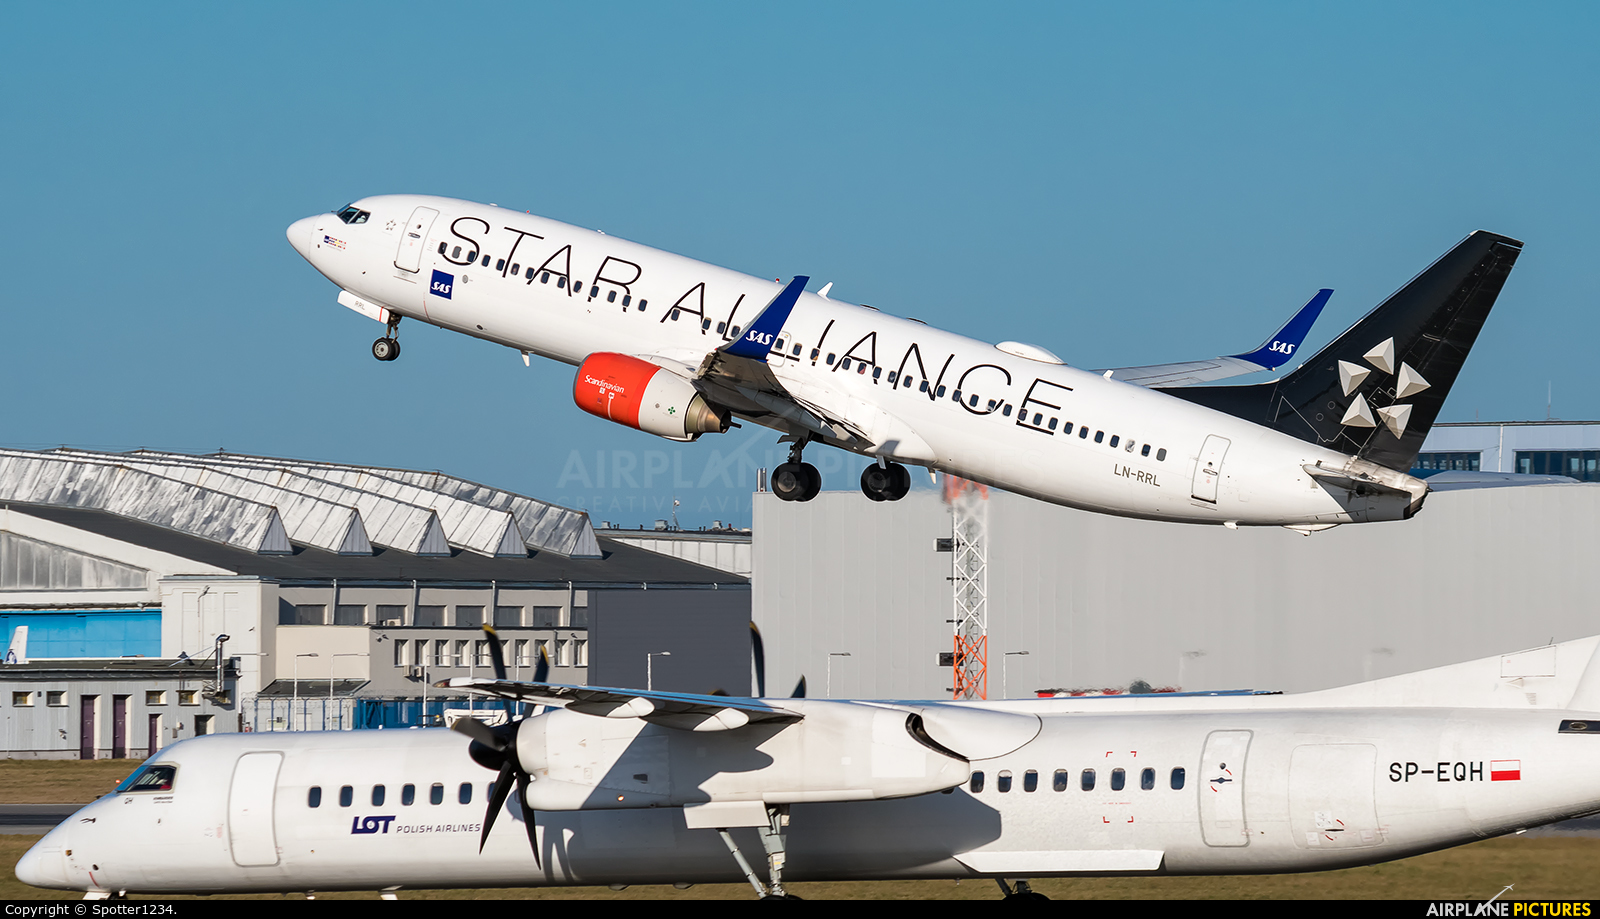 SAS - Scandinavian Airlines LN-RRL aircraft at Warsaw - Frederic Chopin